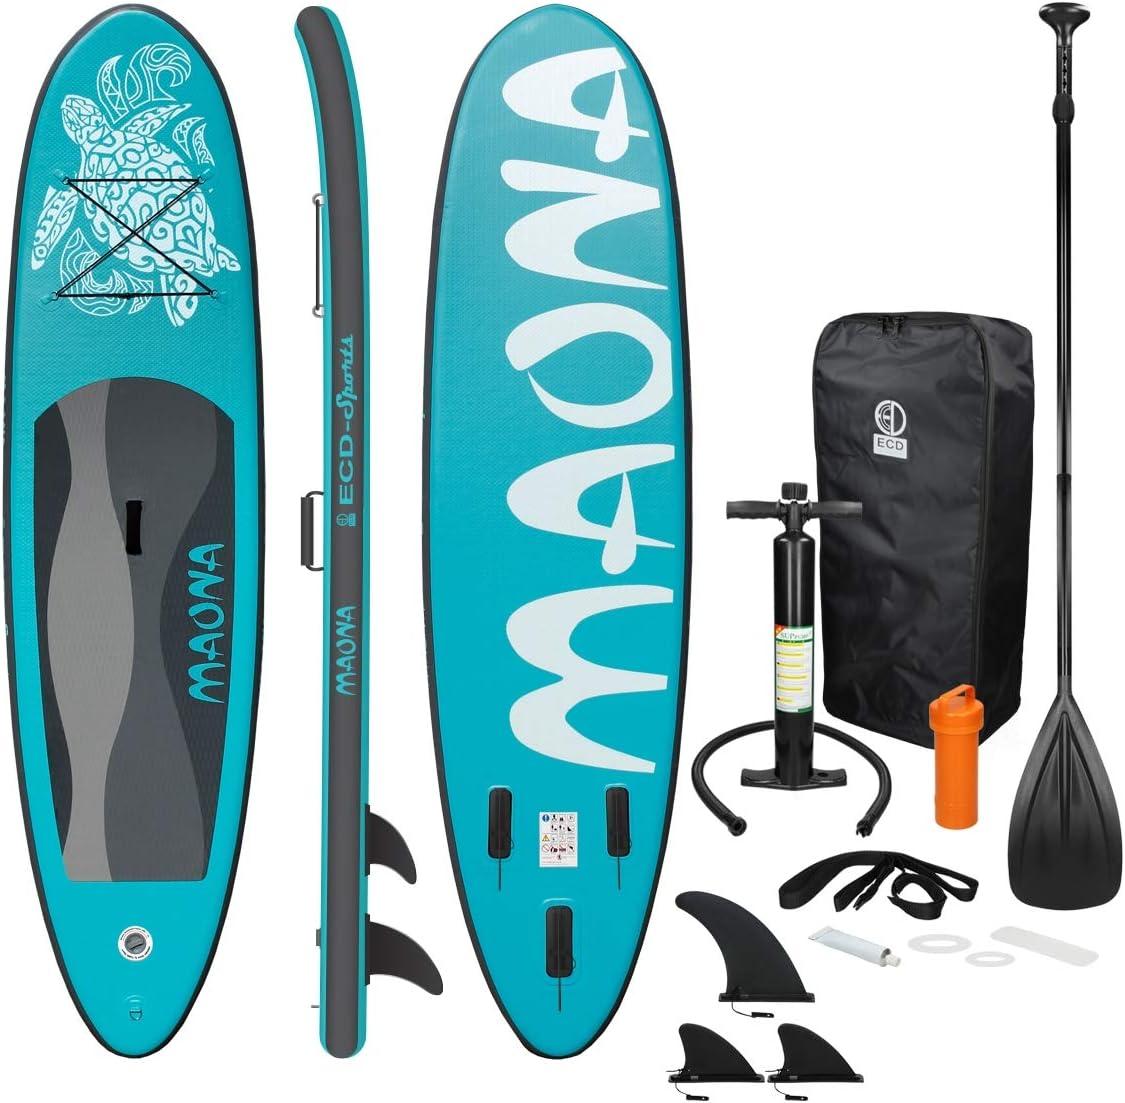 ECD Germany Tabla Hinchable Maona Paddle Surf/Sup 308 x 76 x 10 cm Turquesa Stand up Paddle Board PVC hasta 120kg 3 Aletas deslizantes Diferentes Modelos Incl Paleta Aluminio Bomba y Accesorios